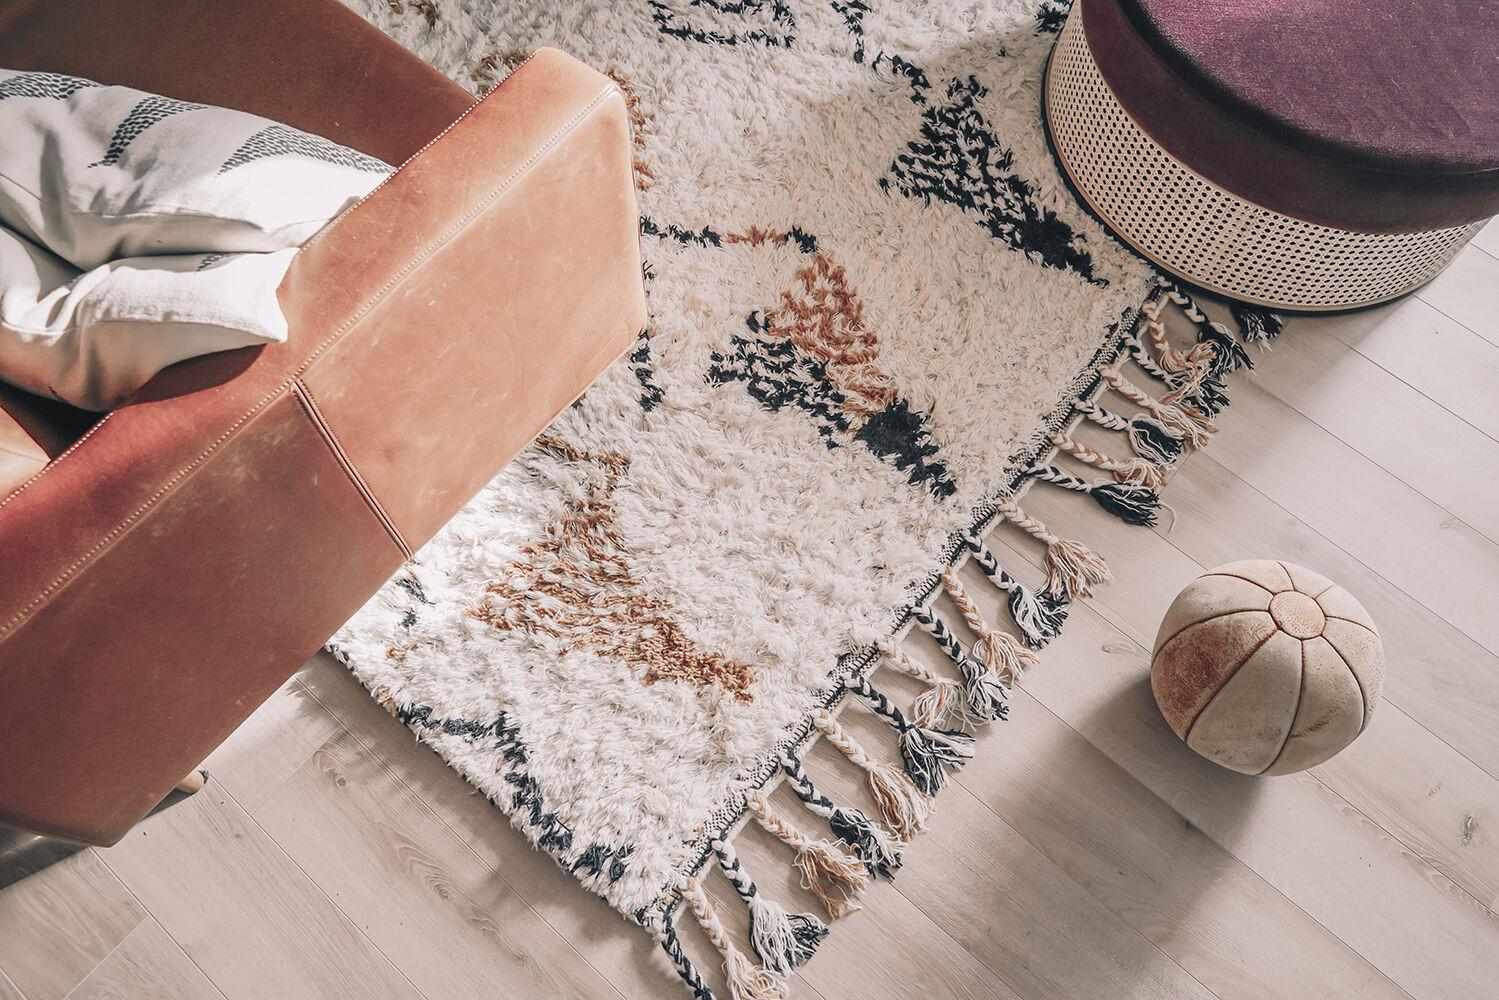 vanja wikström vardagsrum layered matta inredningsinspo 2